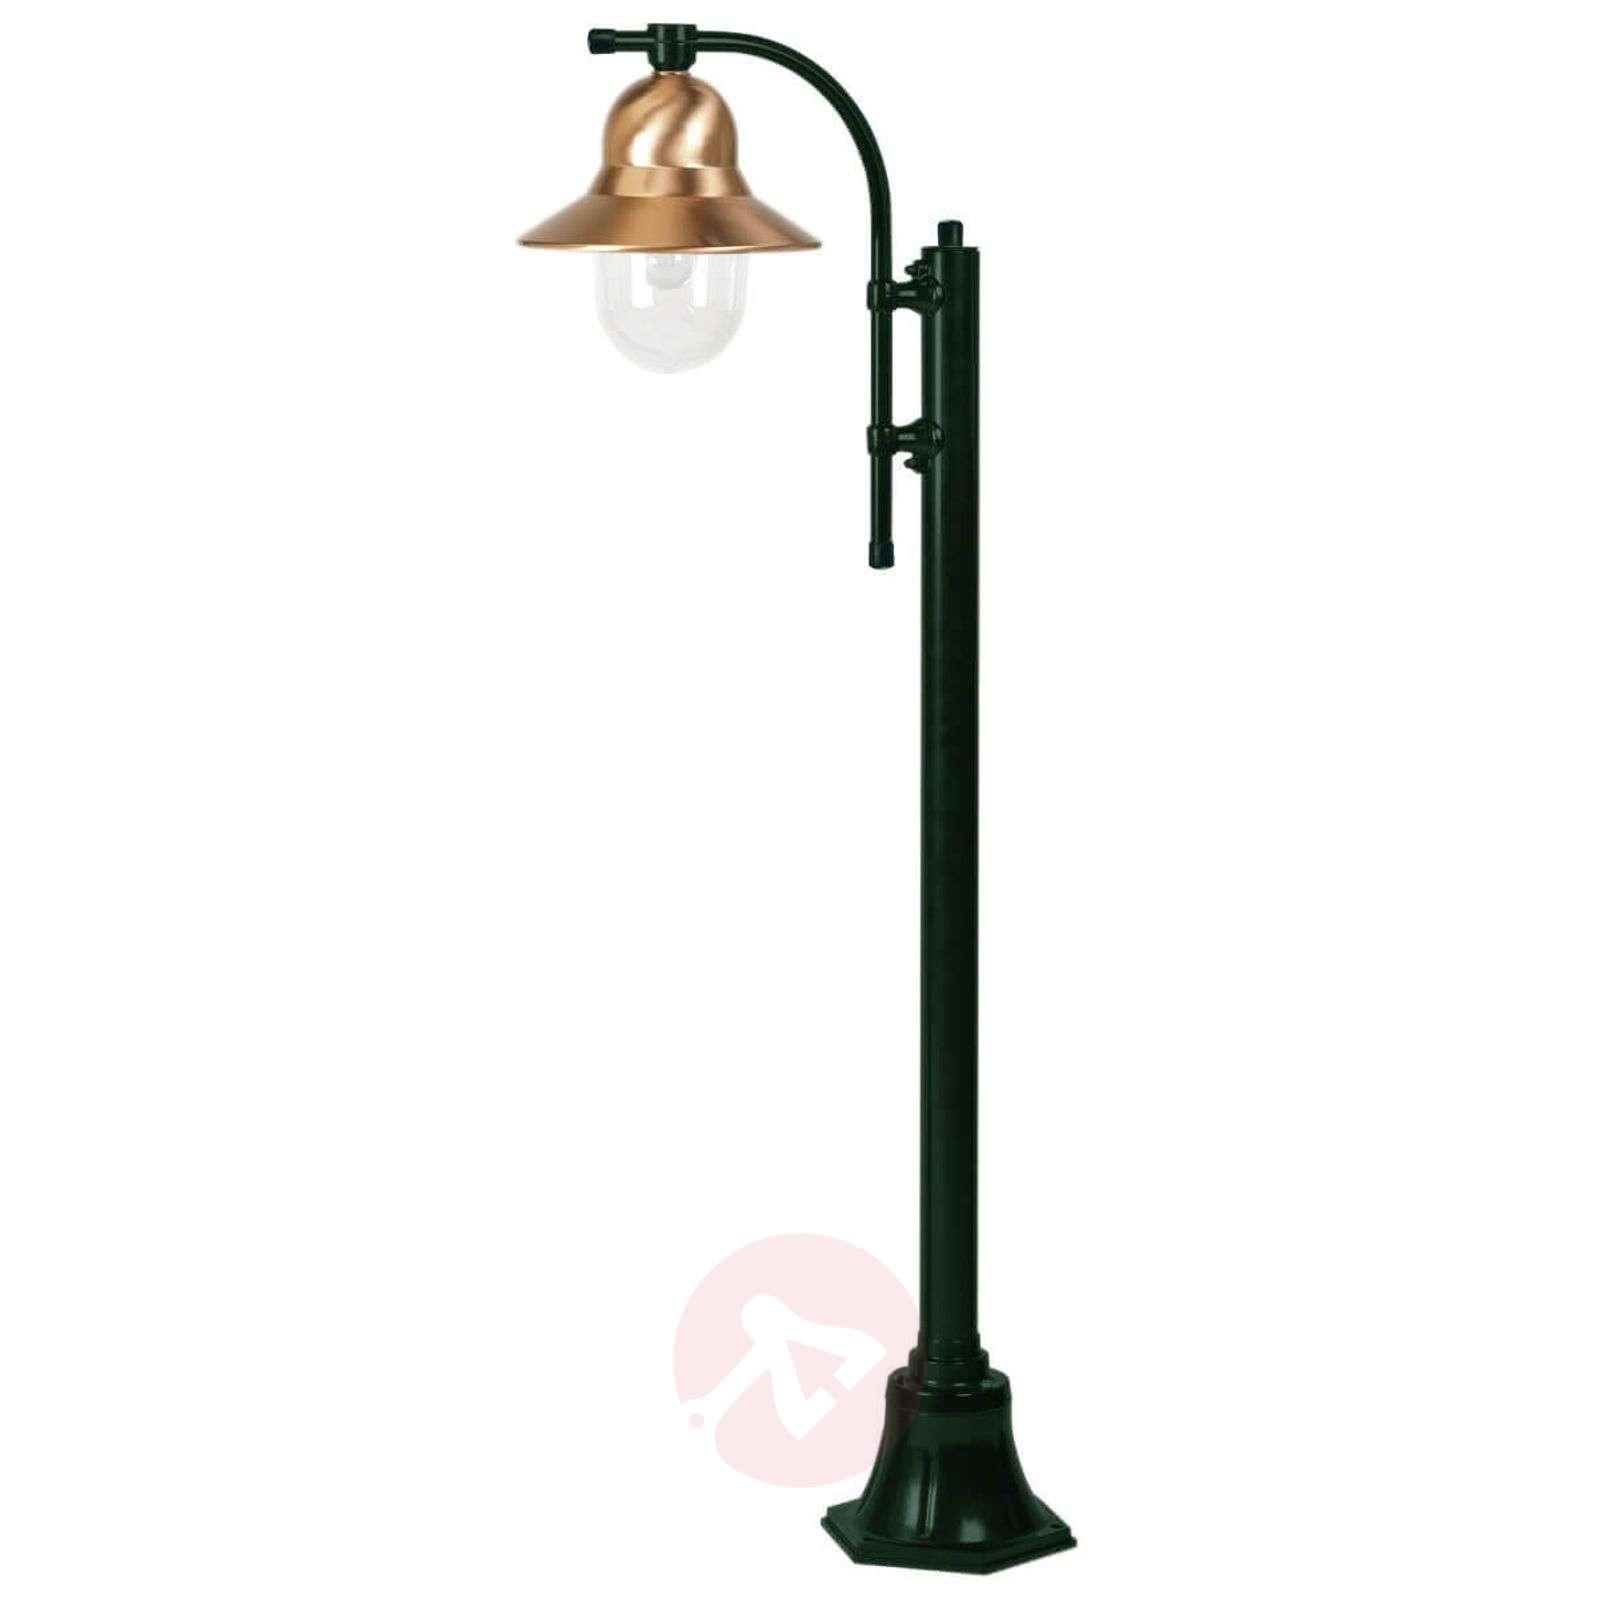 Toscane-lyhtypylväs yksilamppuinen 150 cm-5515094X-02